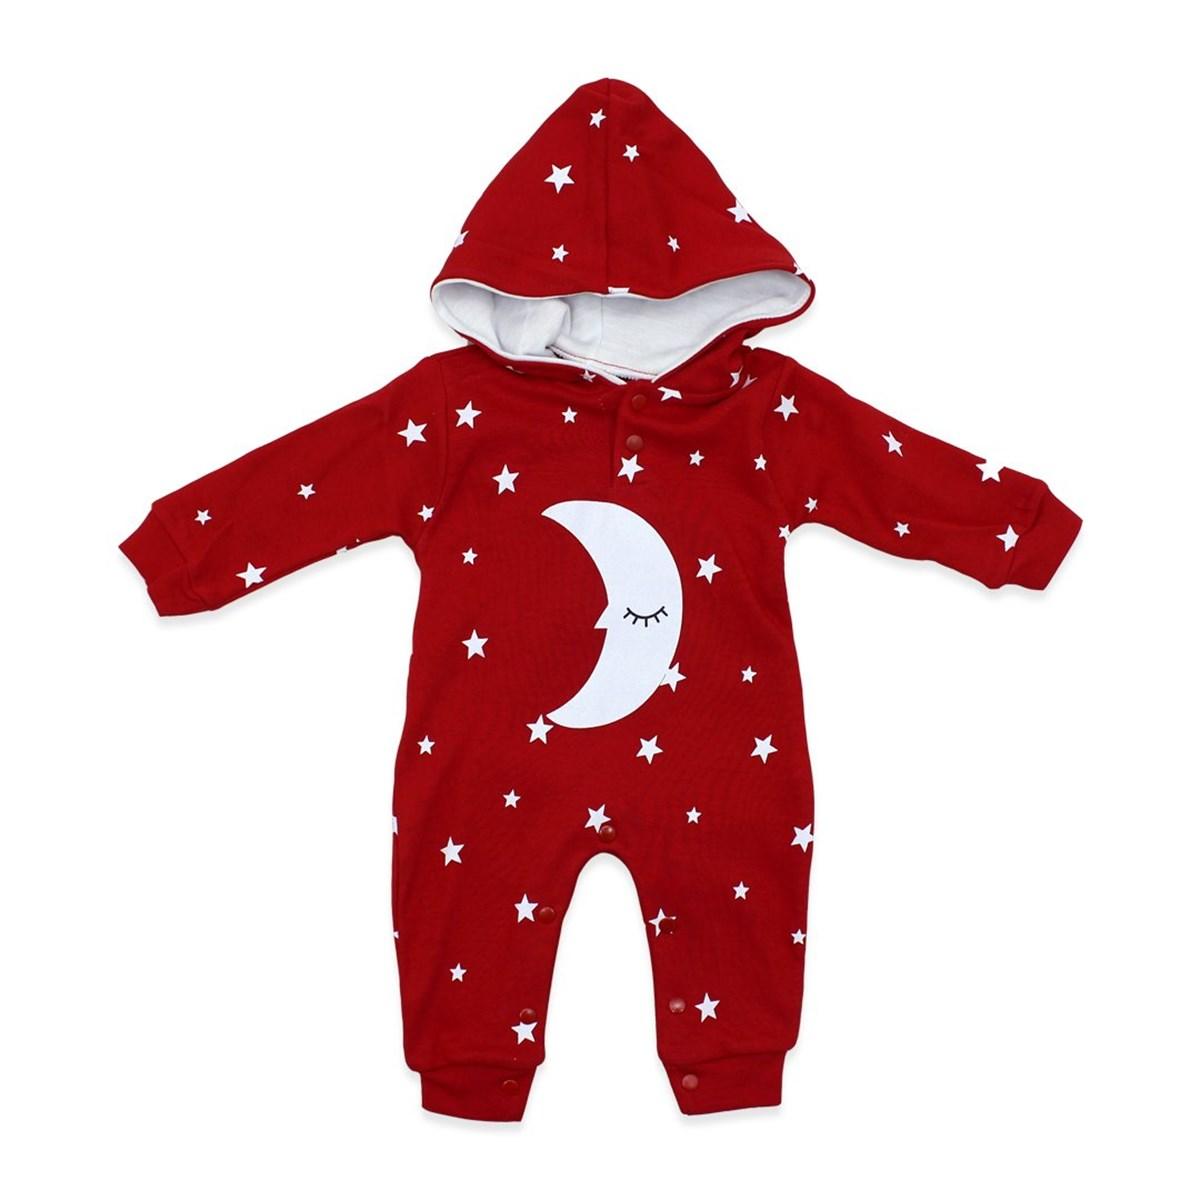 Baby's Star Print Red Romper